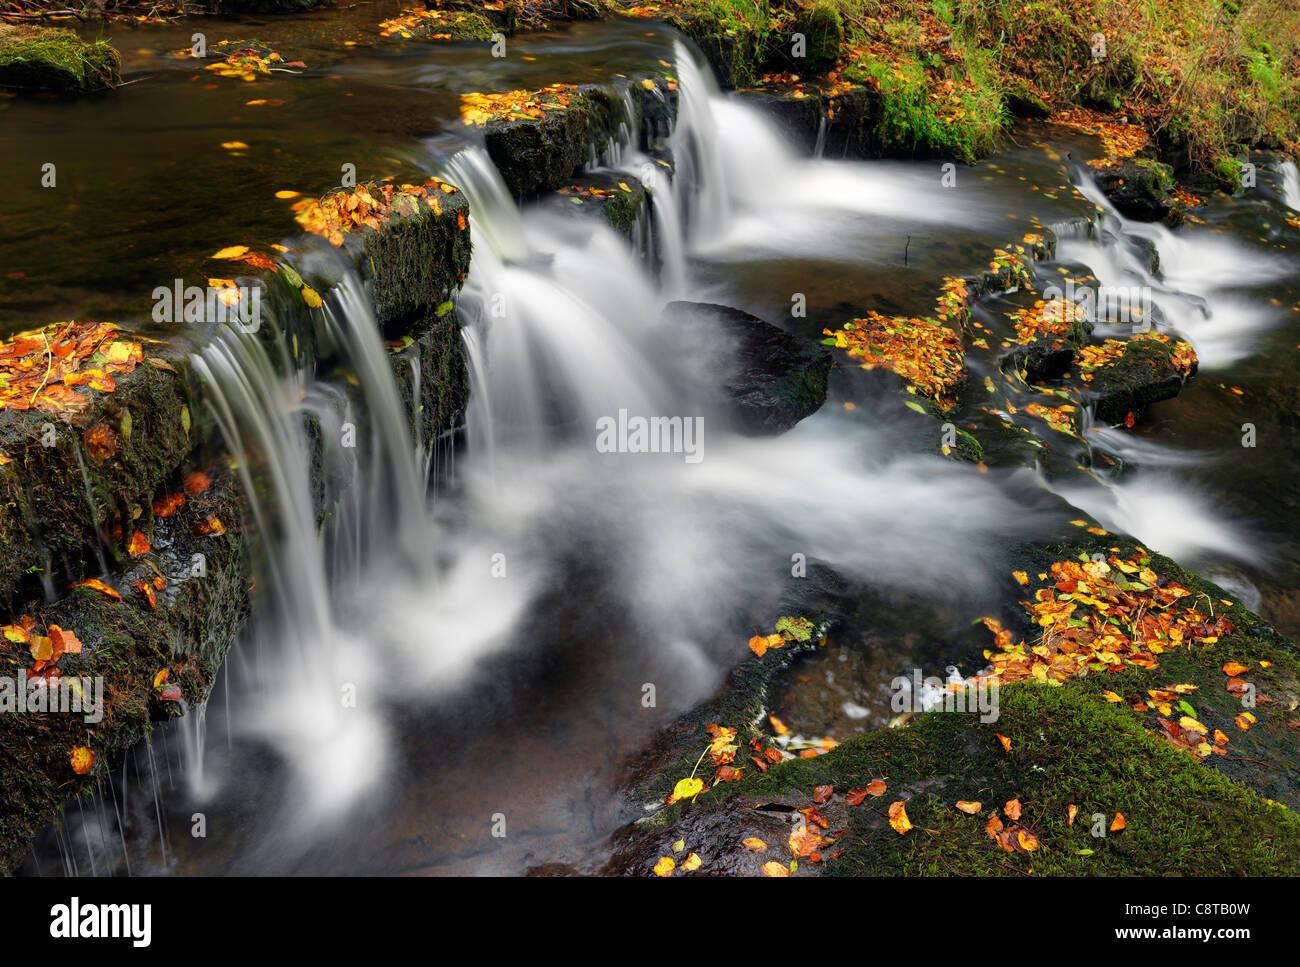 Scalebar Force waterfall, just below the main waterfall on Scalebar Beck - Stock Image